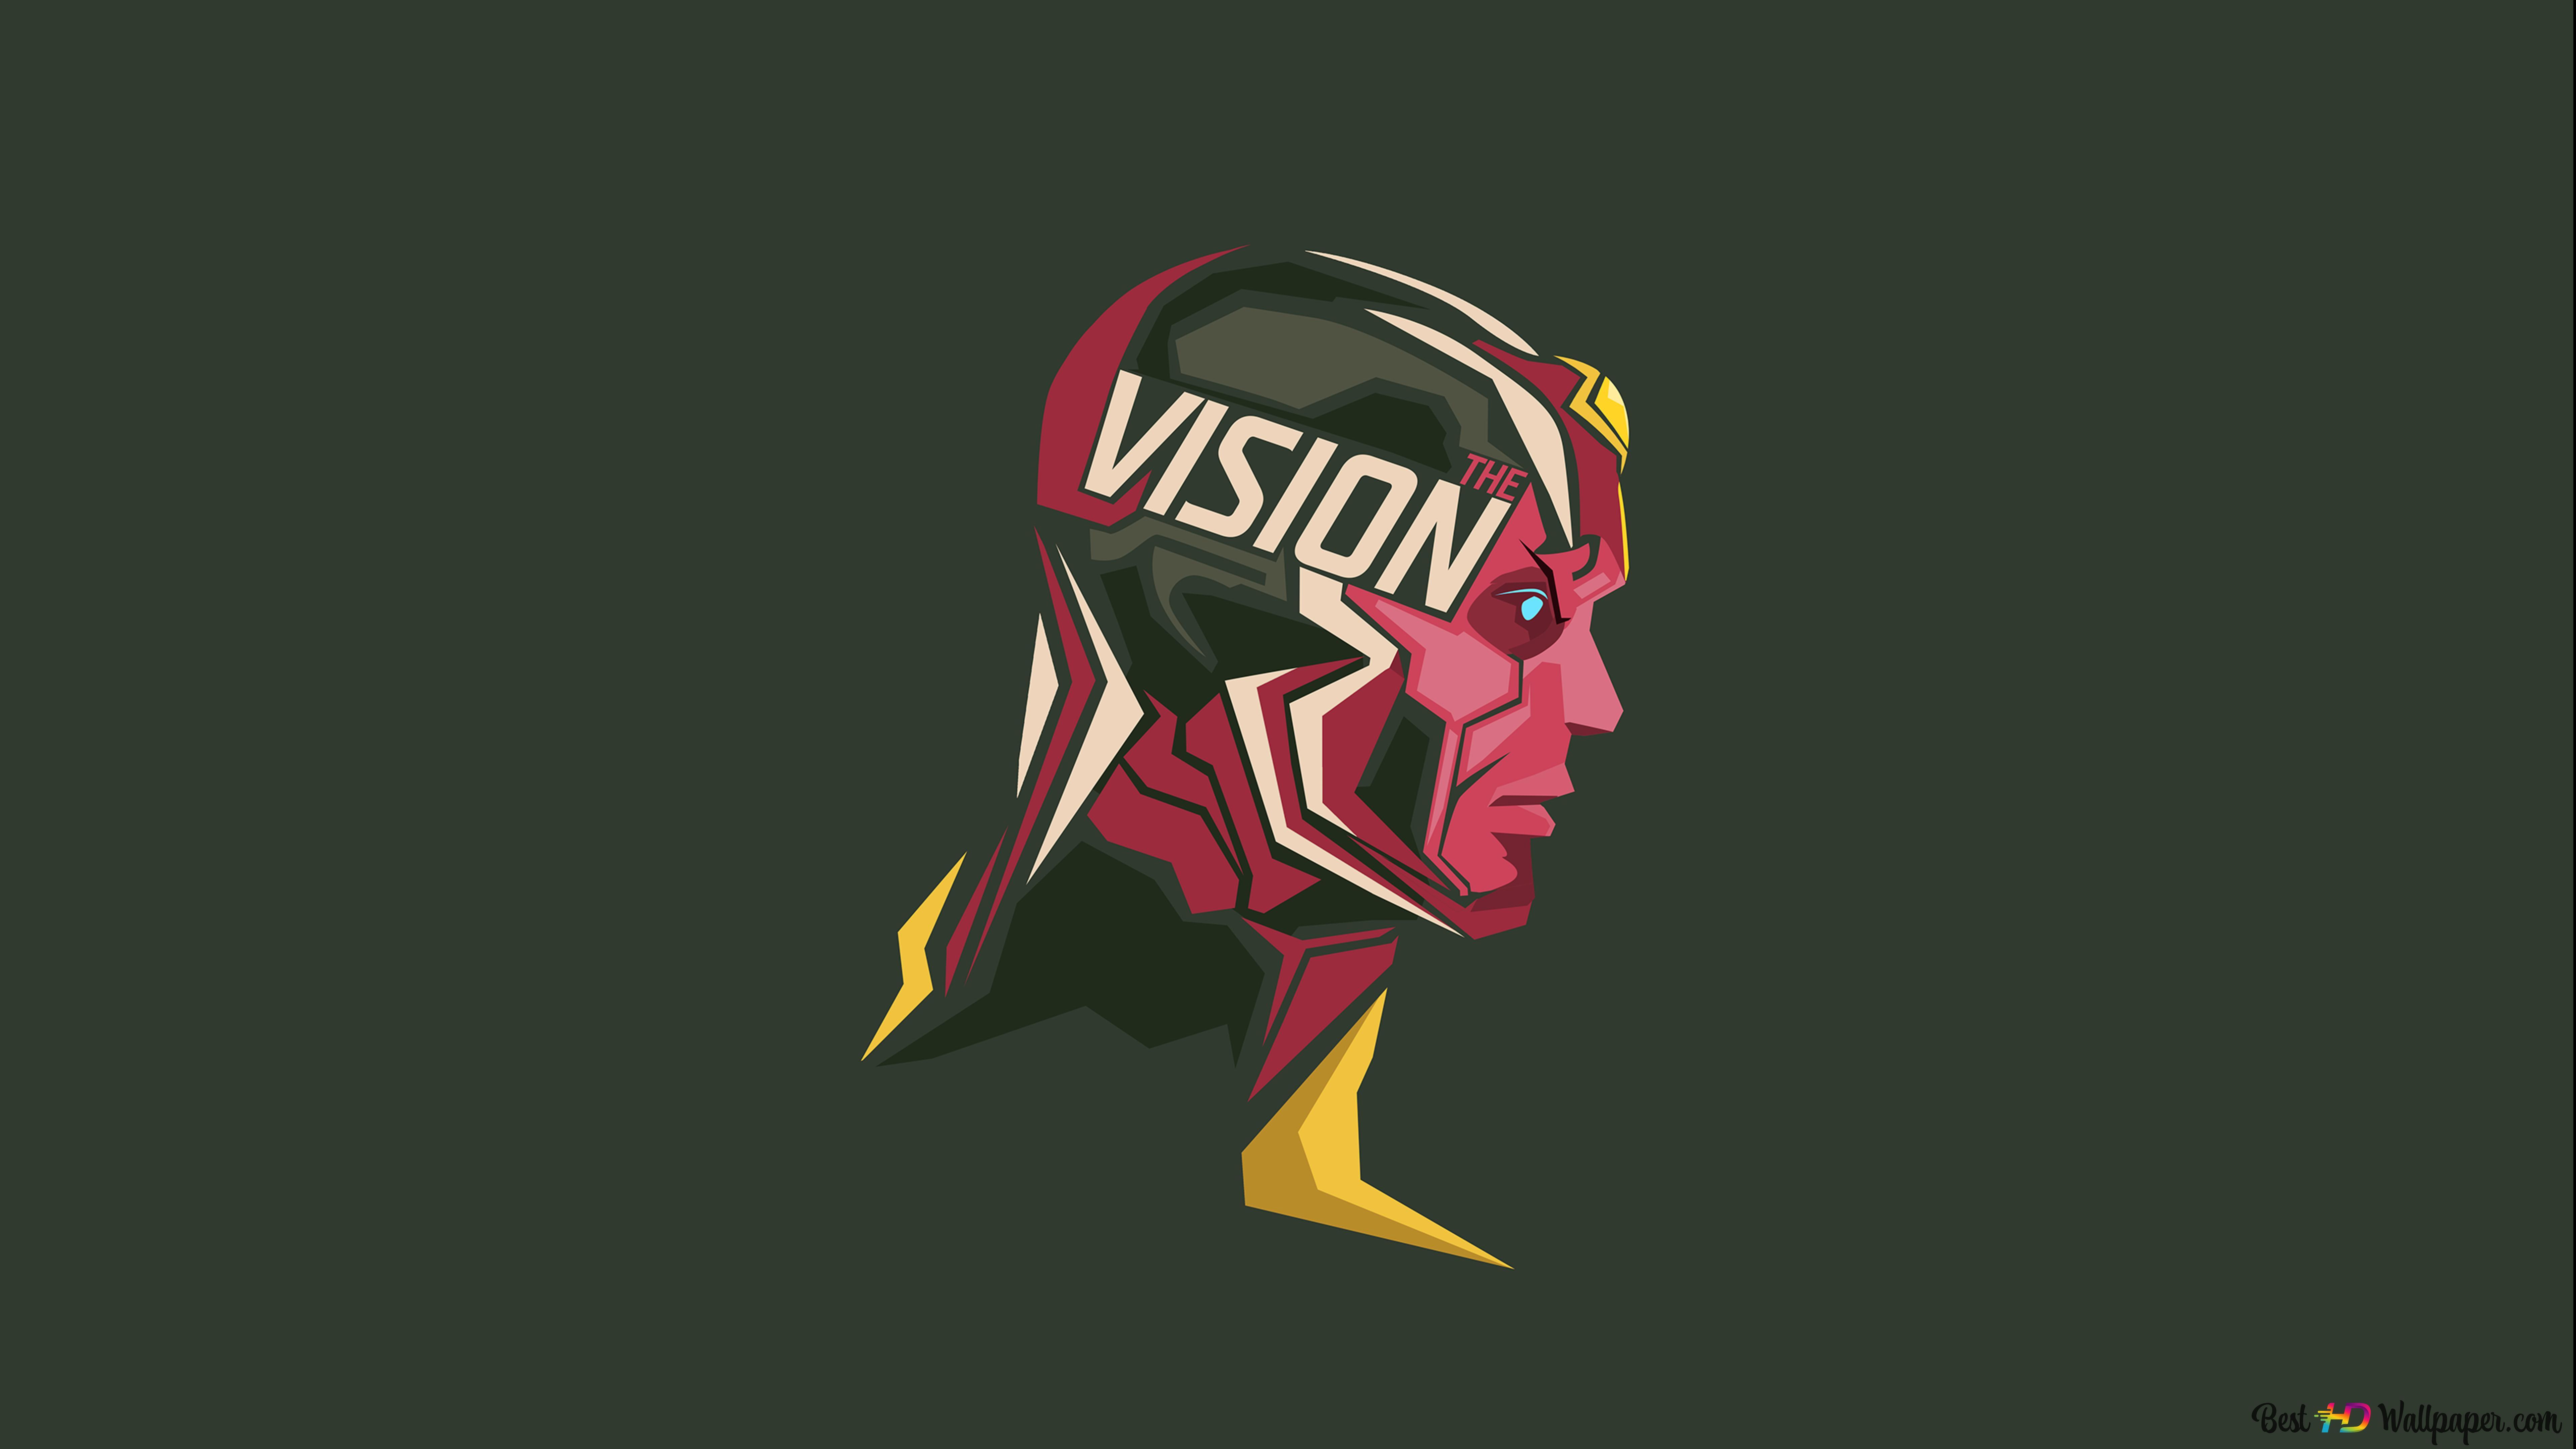 Marvel Comics Ft Vision Minimalist Hd Wallpaper Download